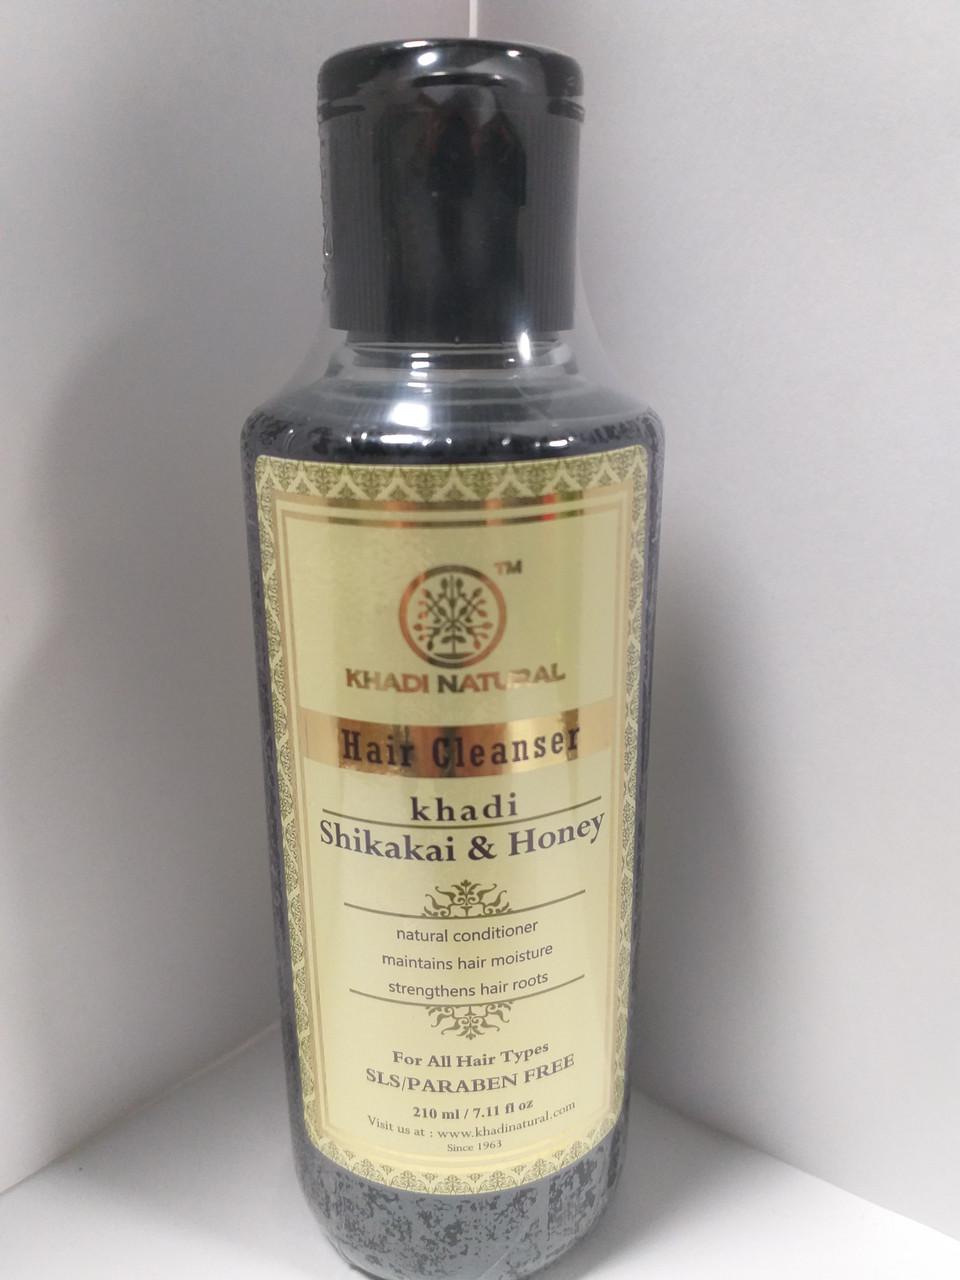 Шампунь Кхади Шикакай и мед, без СЛС и парабенов, 210 мл, Khadi Shikakai & Honey